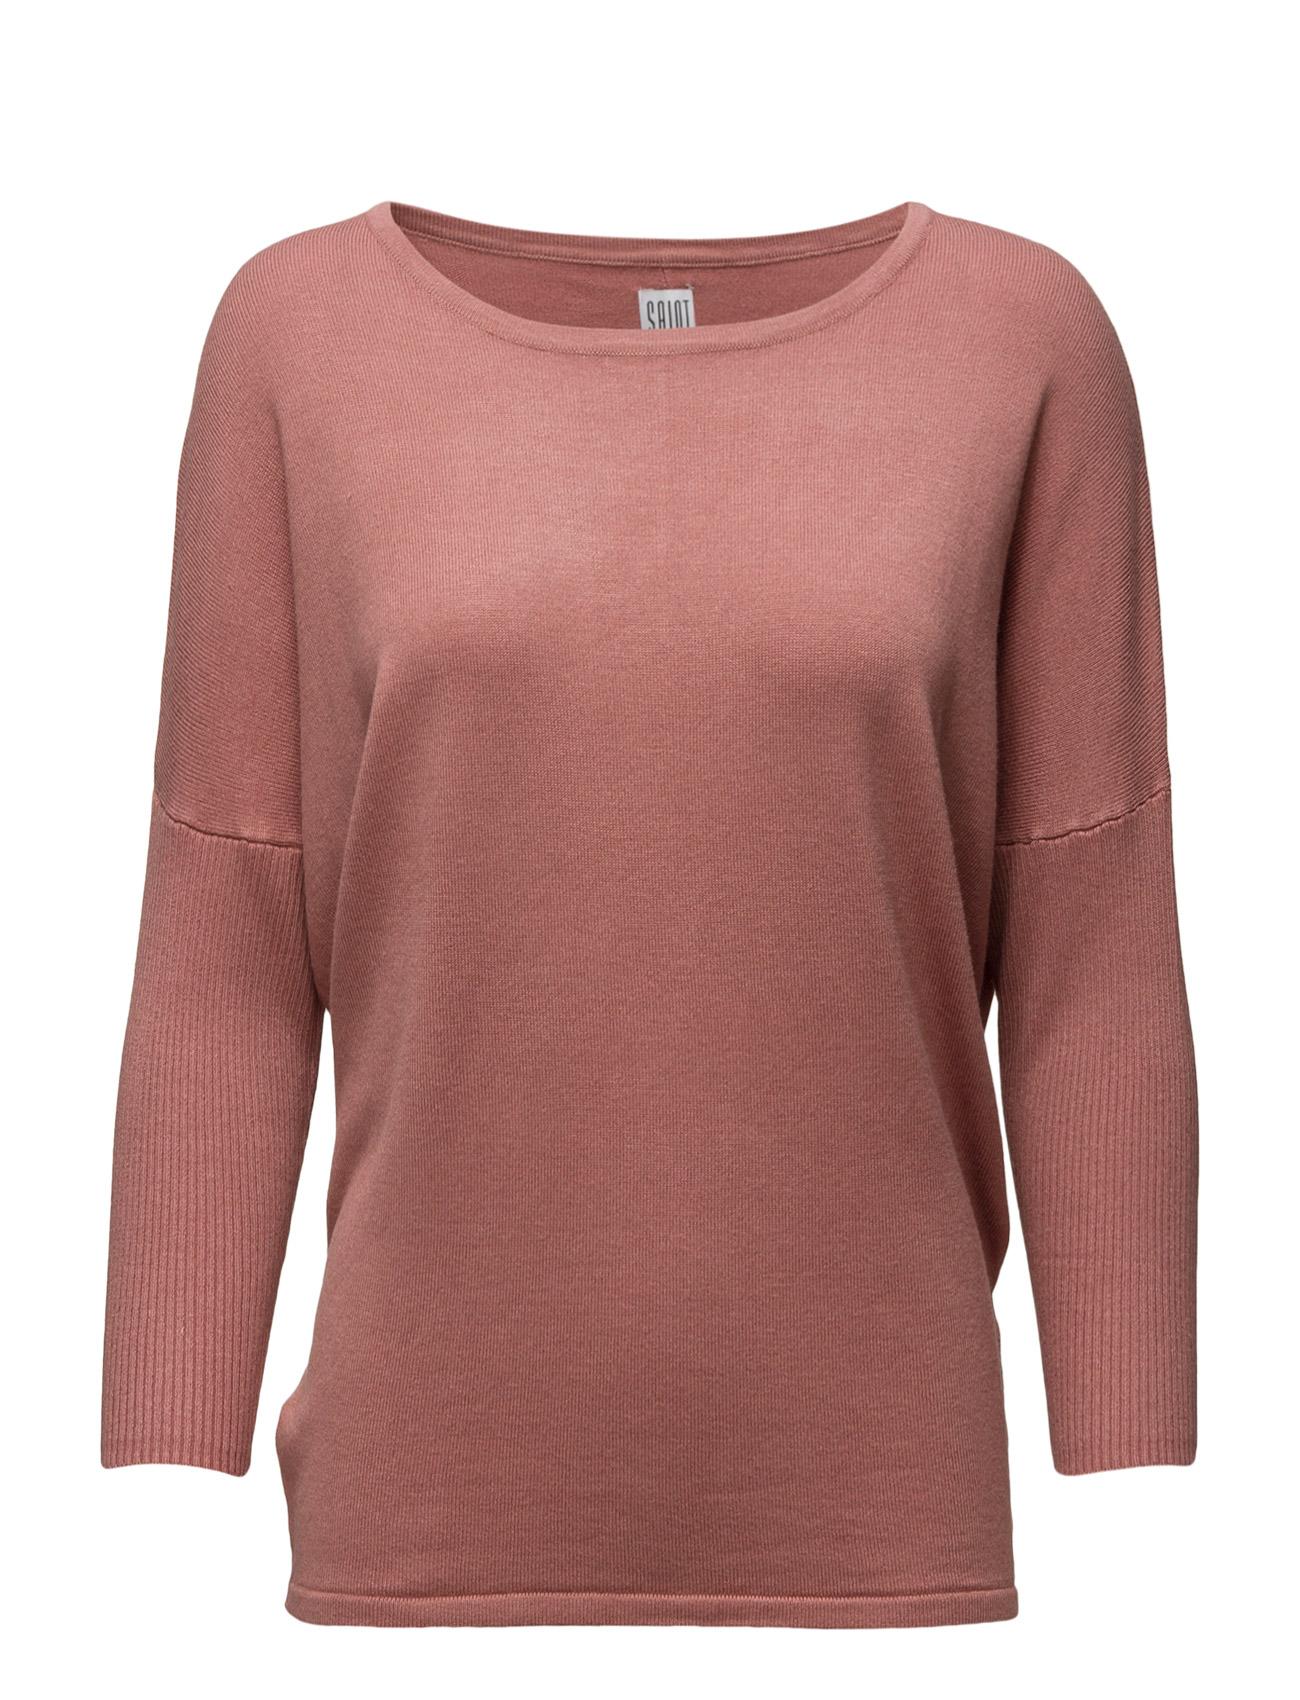 Knit Blouse W Rib Sl Saint Tropez Sweatshirts til Kvinder i